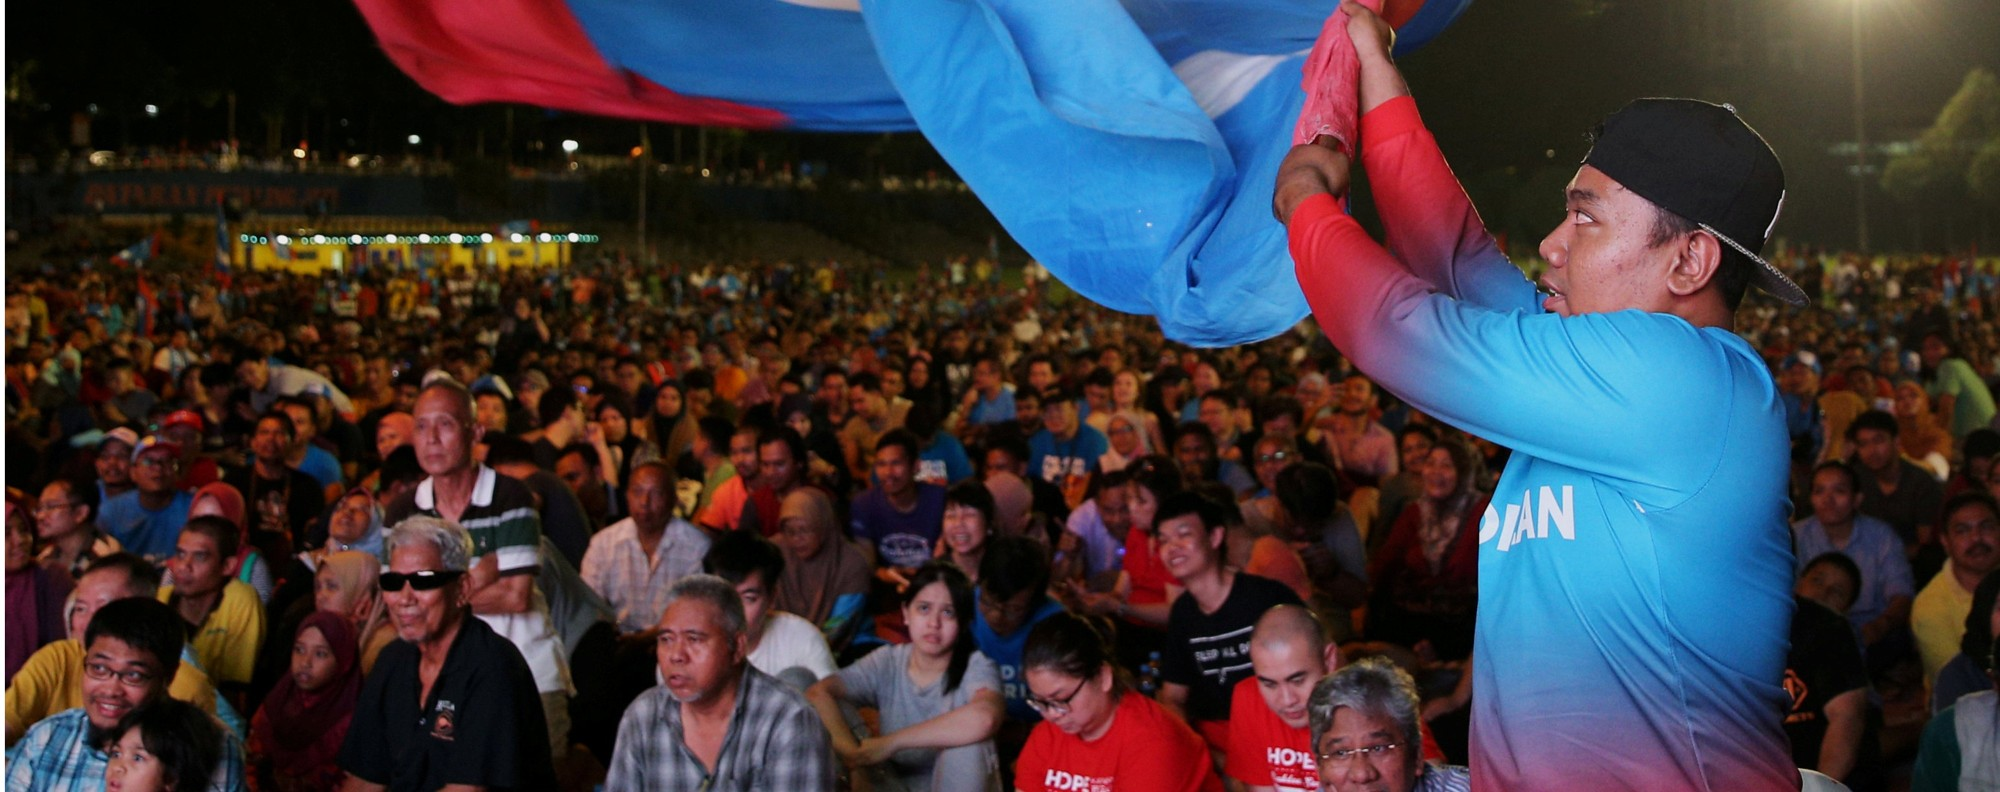 Mahathir supporters in Petaling Jaya, Malaysia. Photo: Reuters